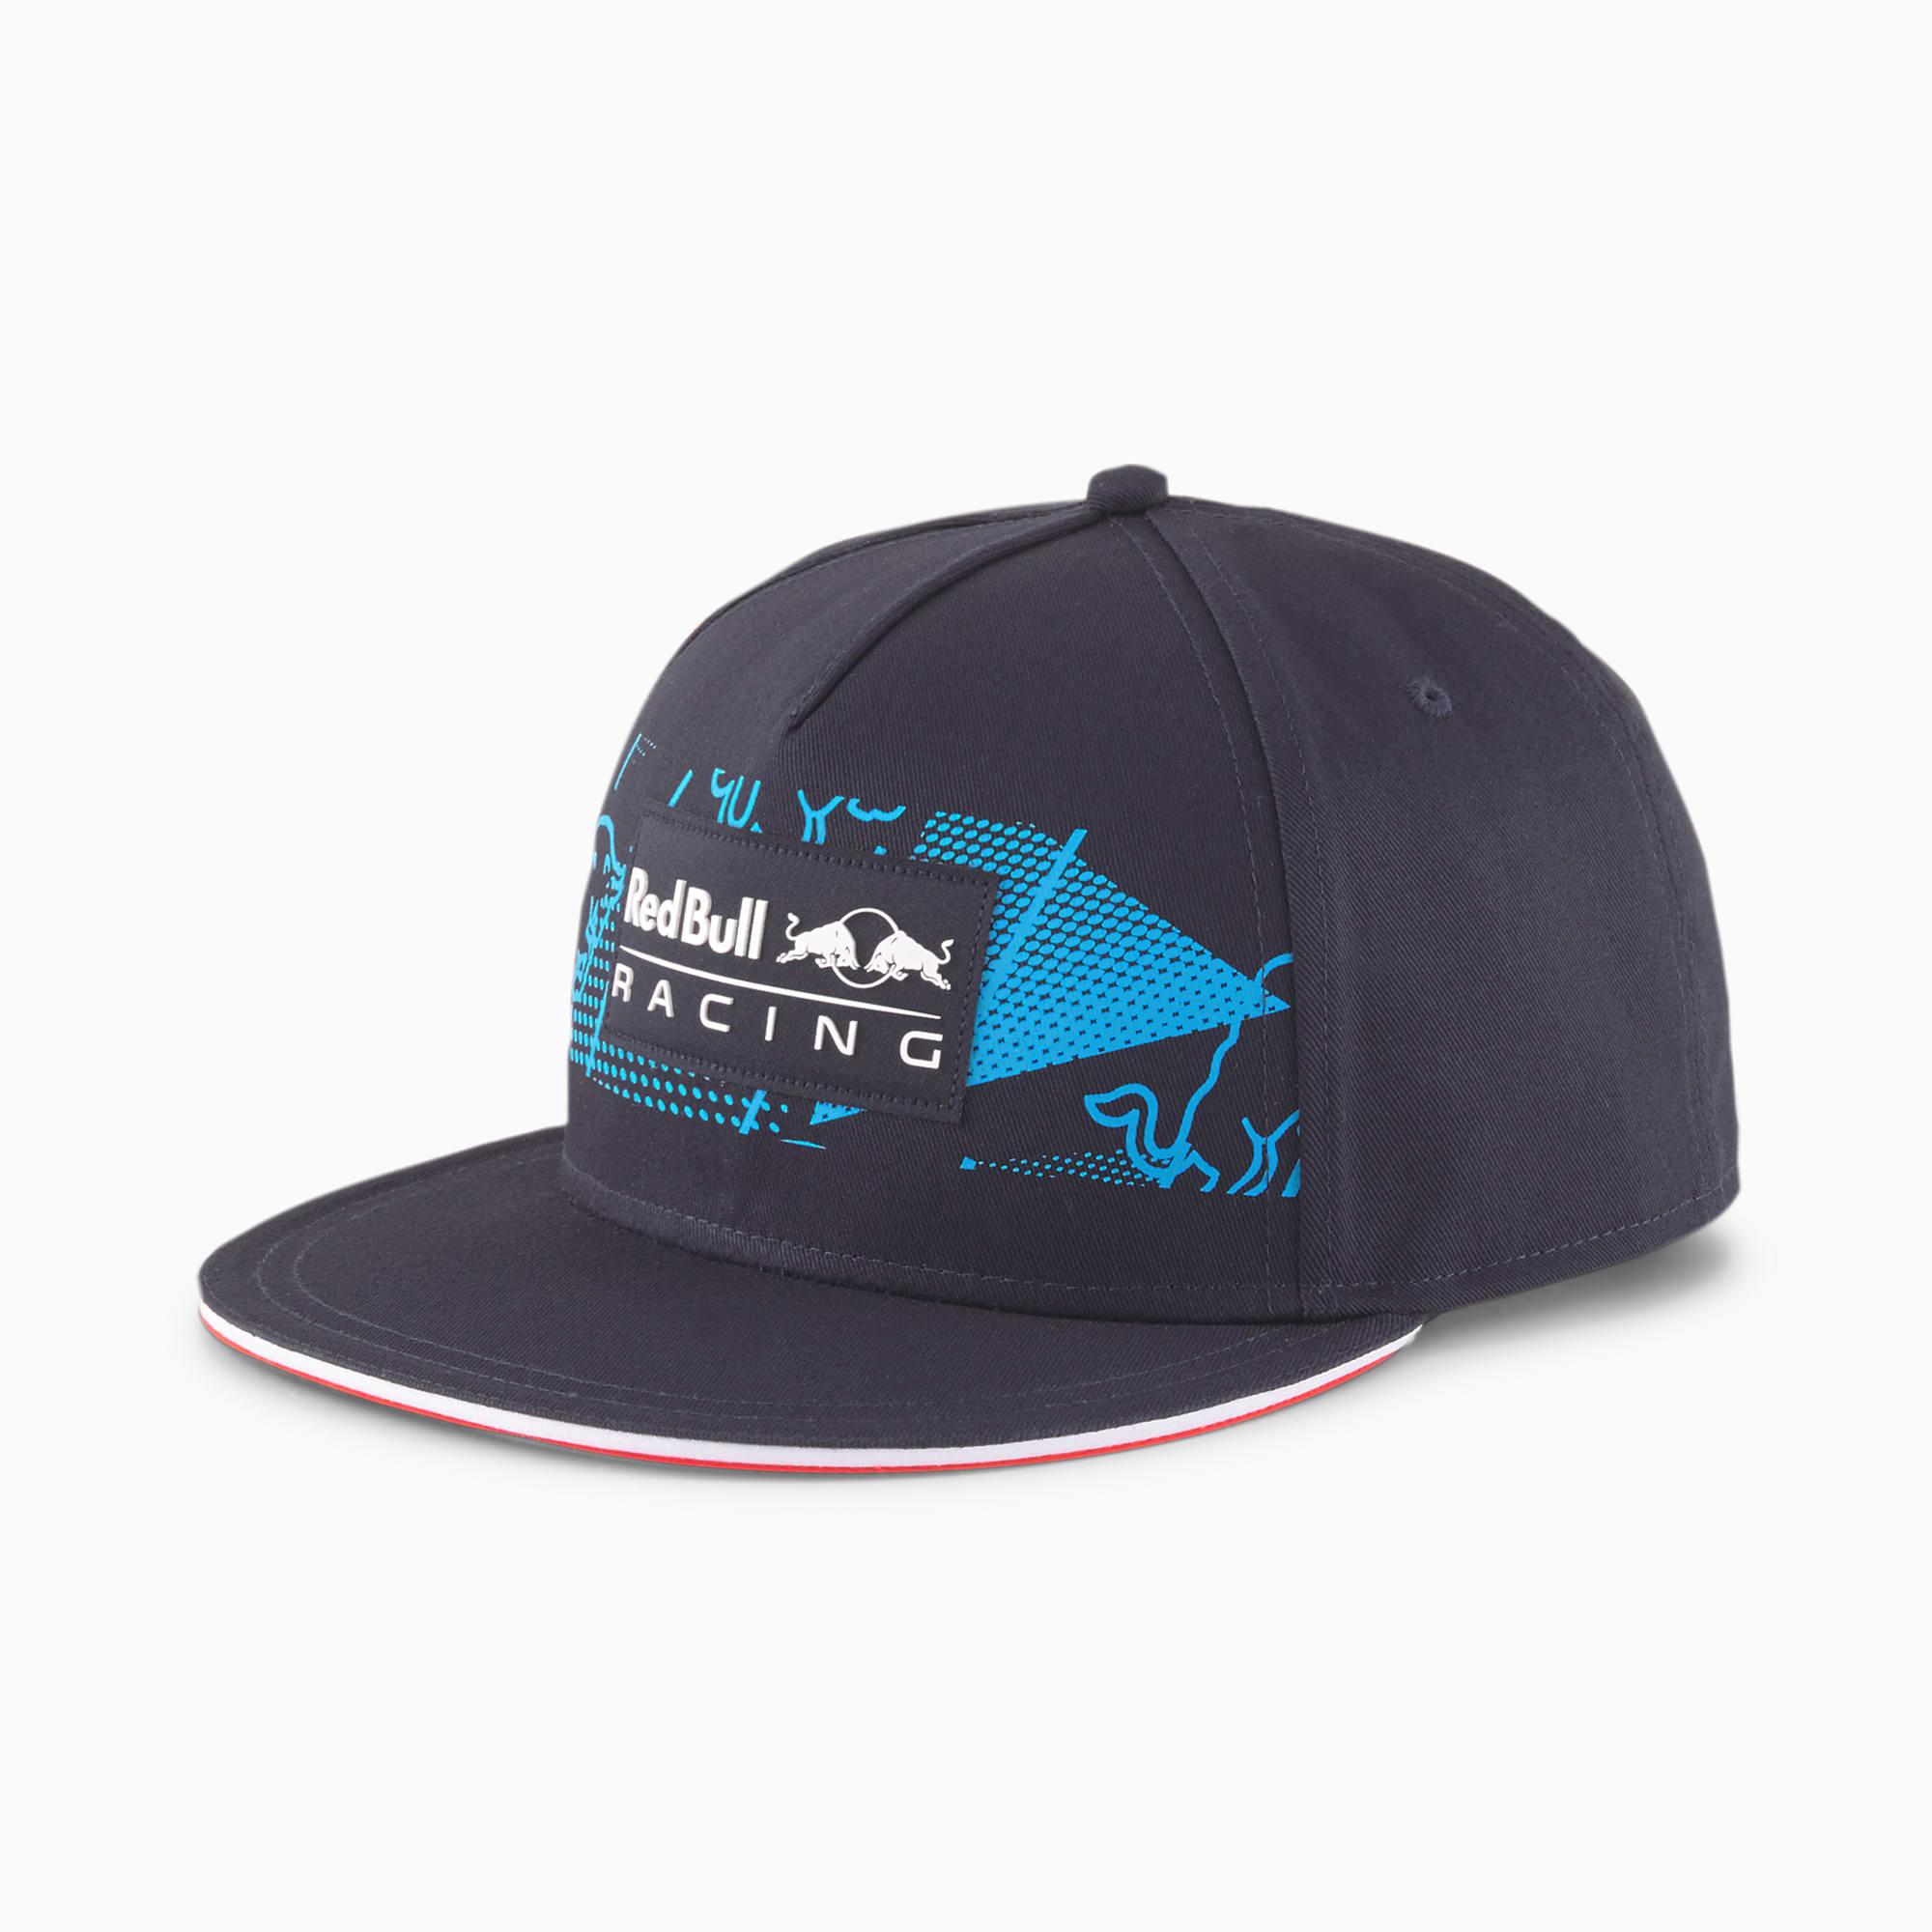 PUMA Red Bull Racing Lifestyle Cap | Mit Aucun | Schwarz